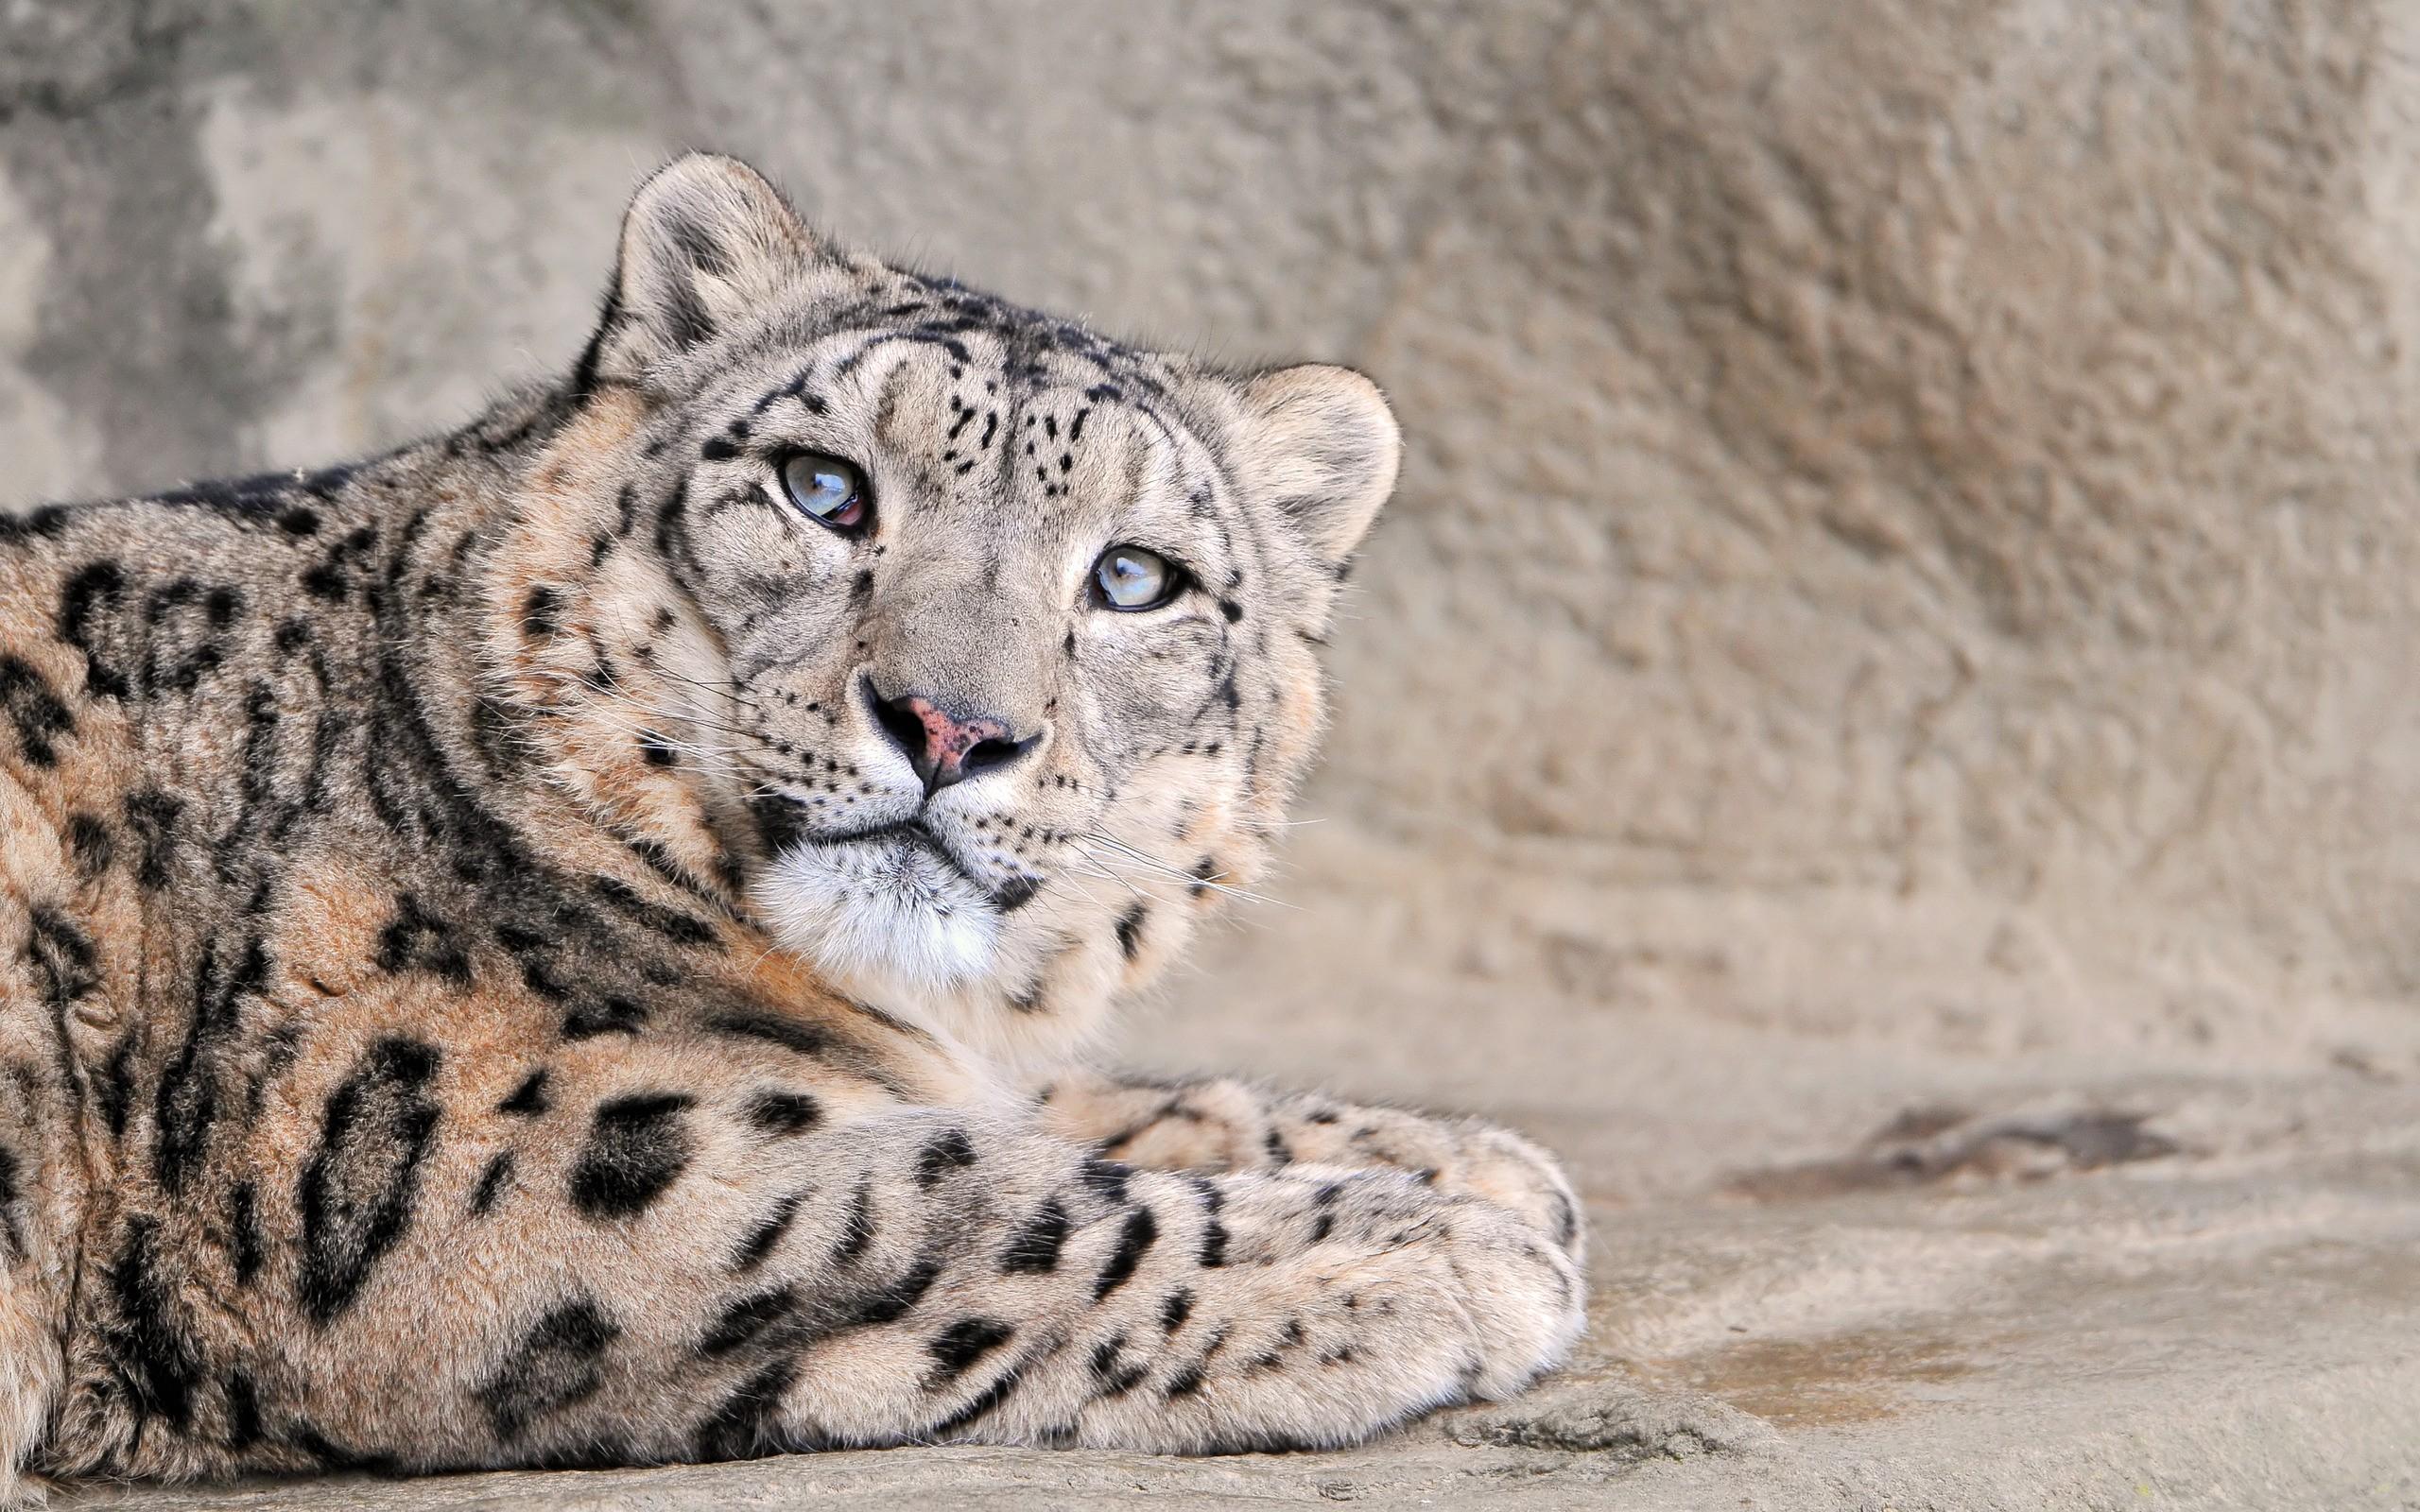 Fotos de leopardo - 2560x1600